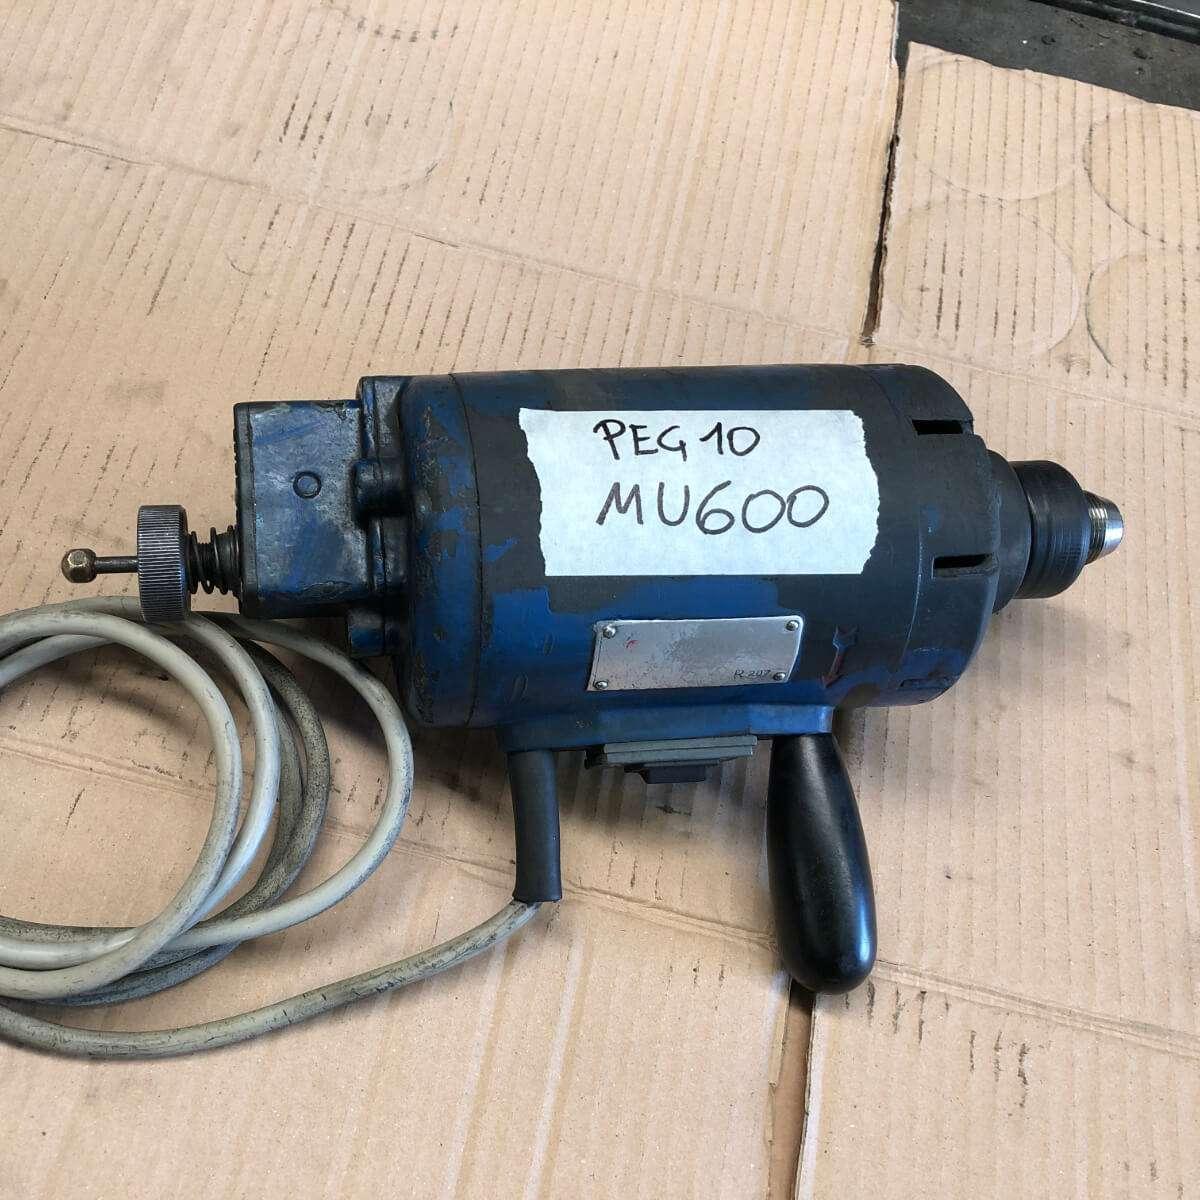 mu600 - PEG 10 Used Valve Guide Honing Machine